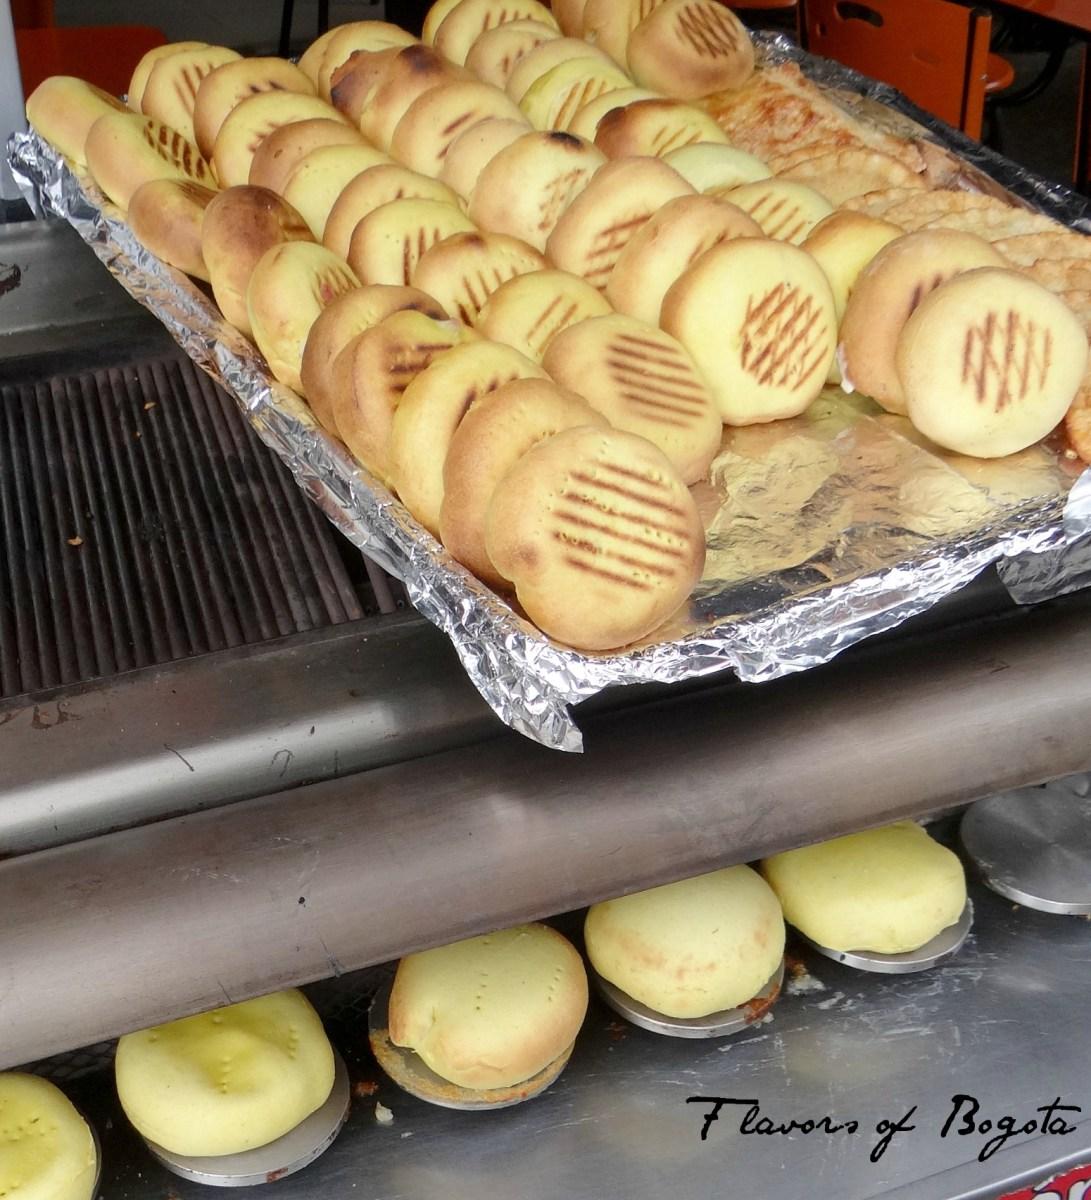 Flavor Fridays: Arepas boyacenses in Bogota